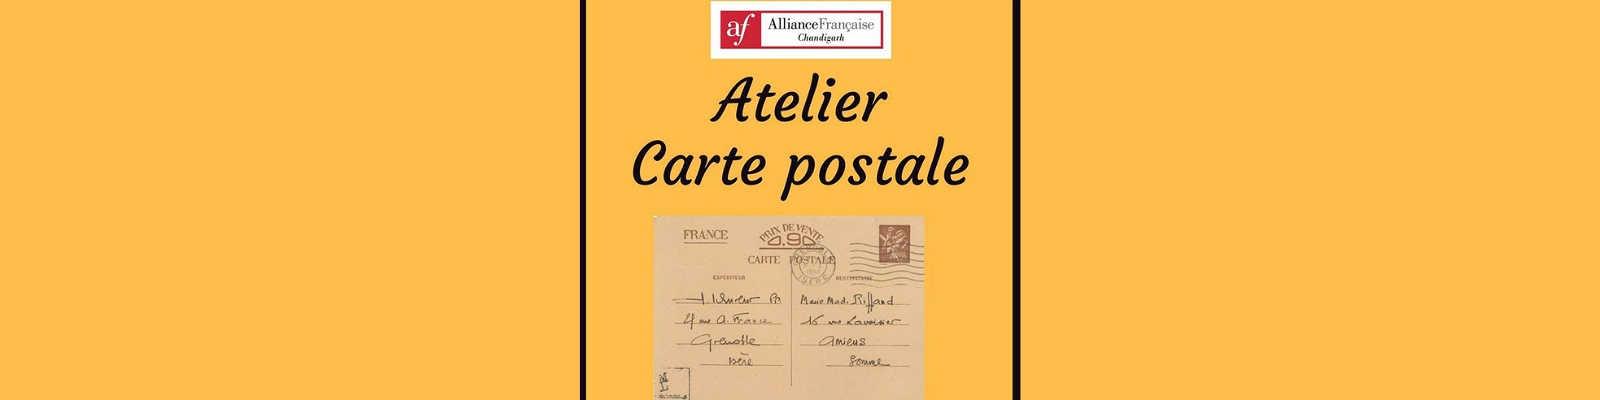 Carte Postale Francaise.Atelier Carte Postale Citywoofer